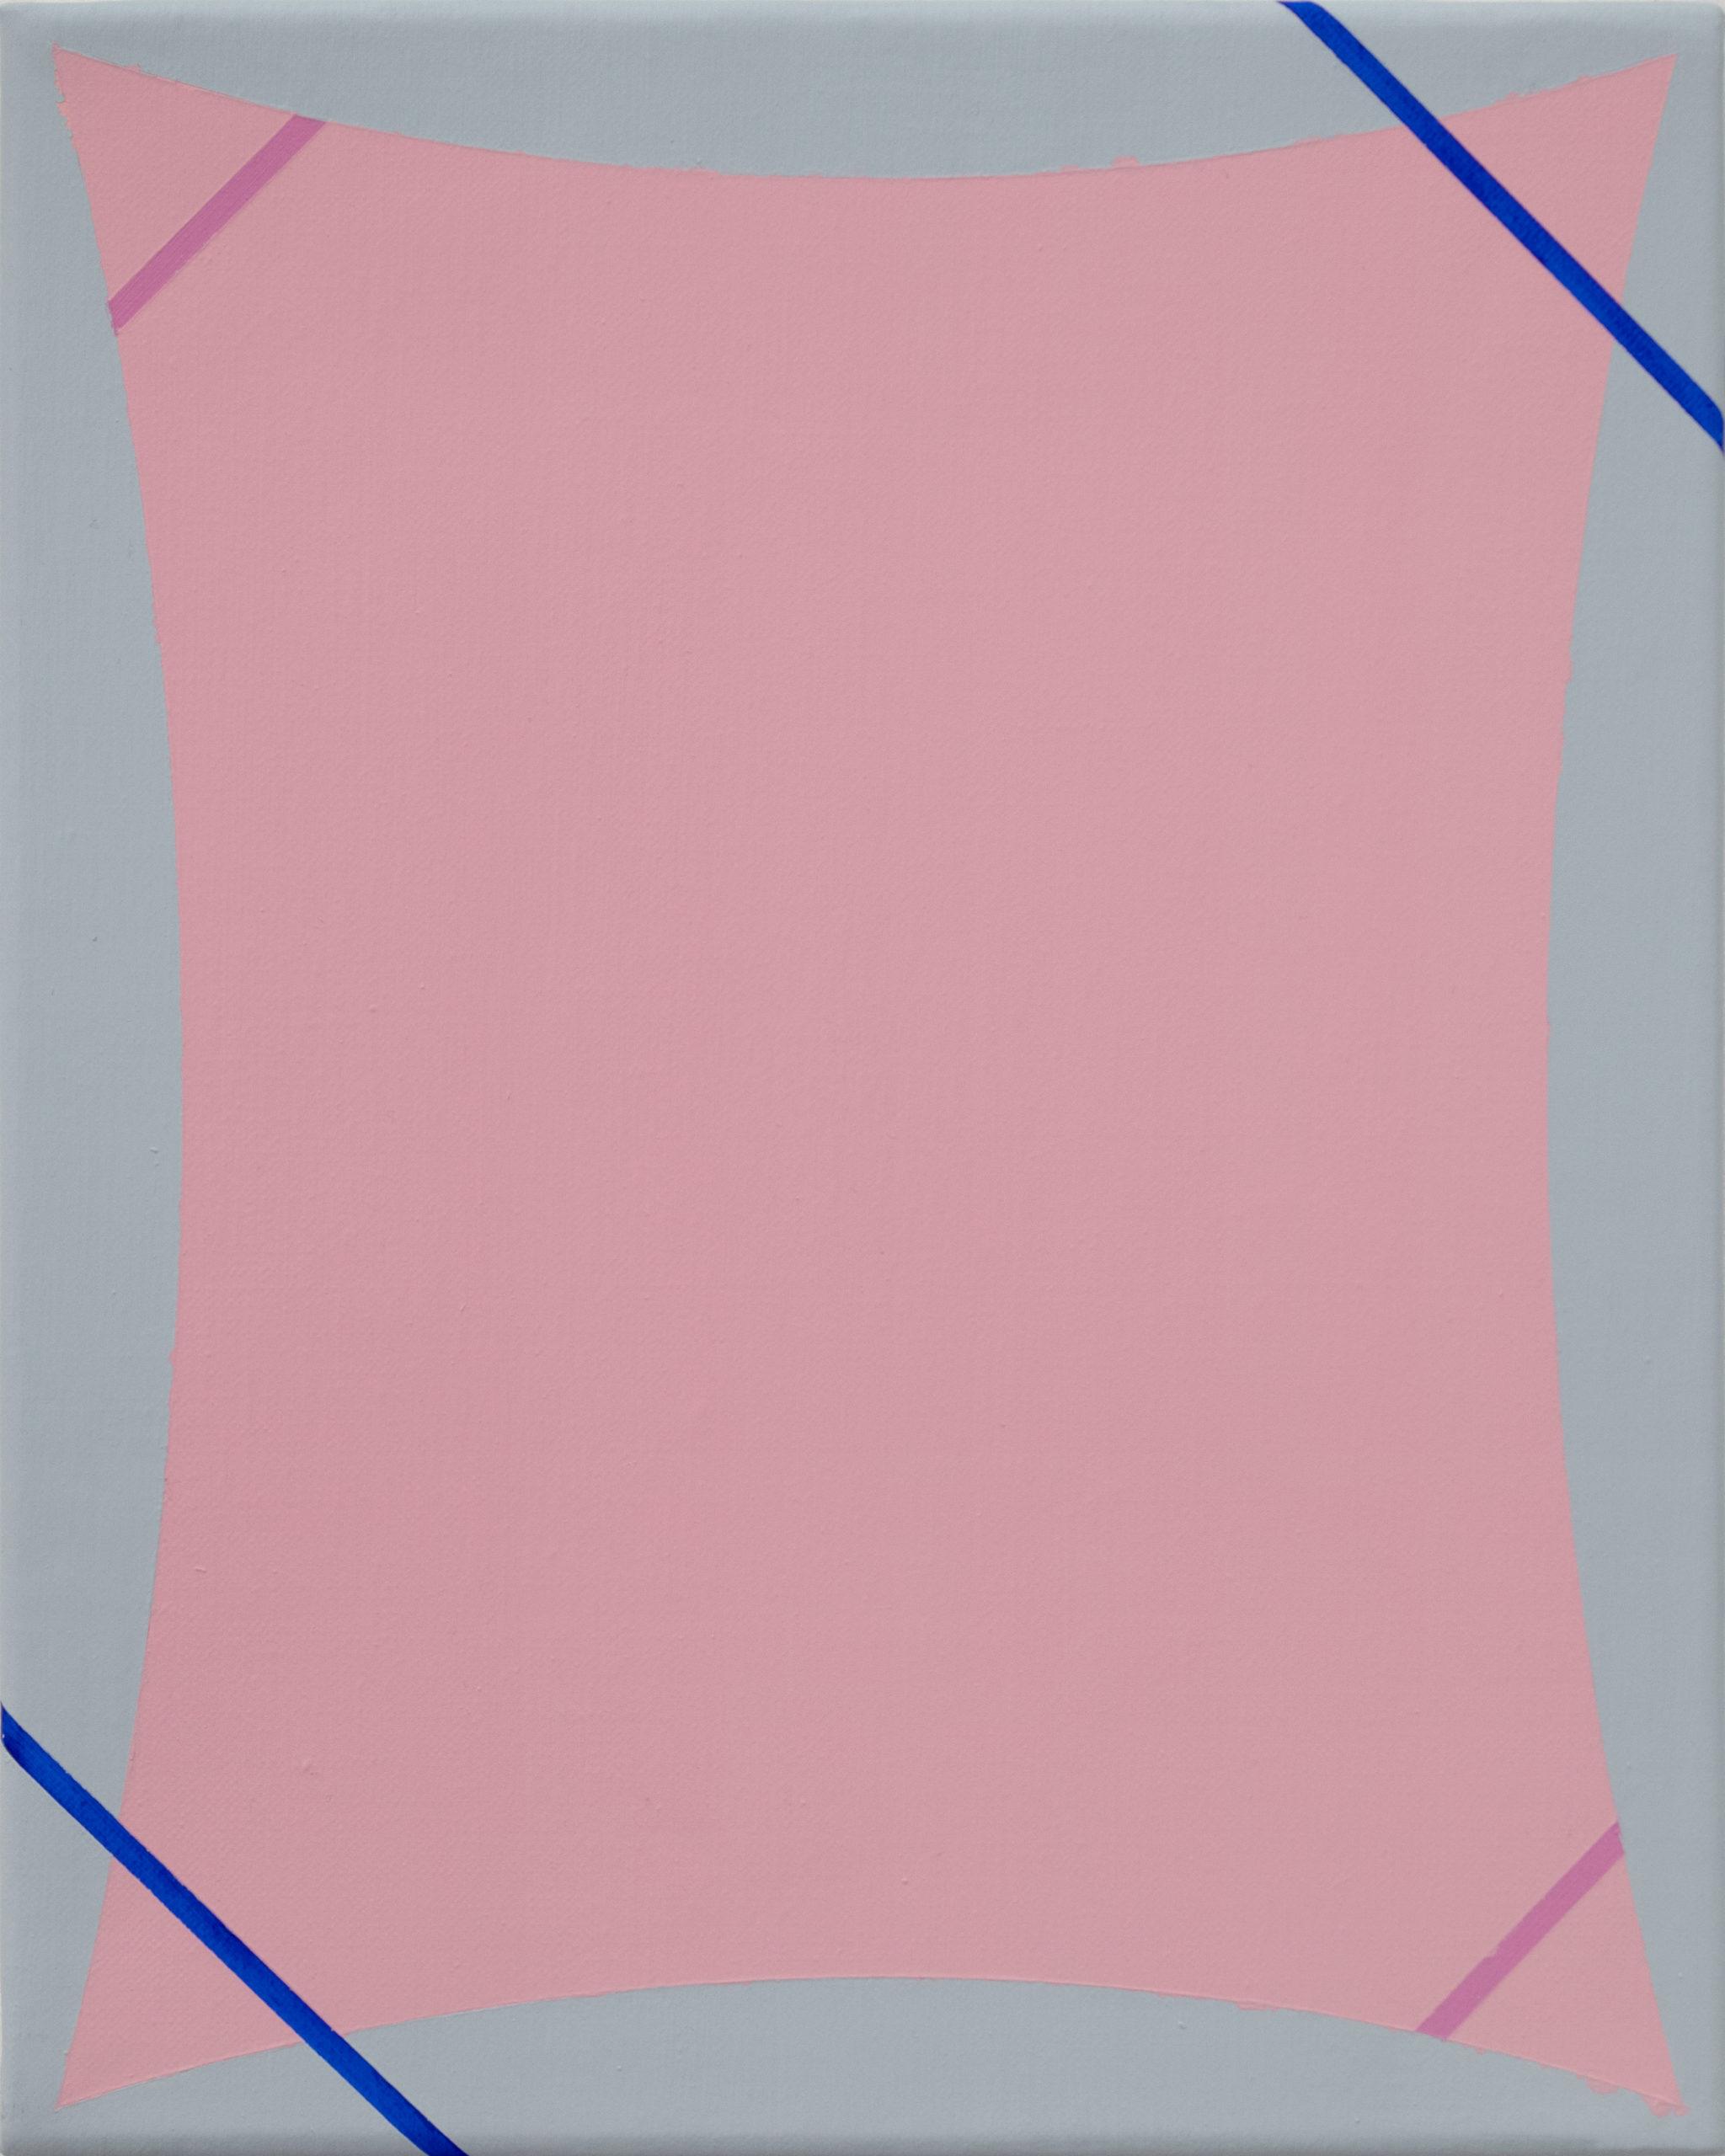 Untitled (Grey Pink Pink Blue)